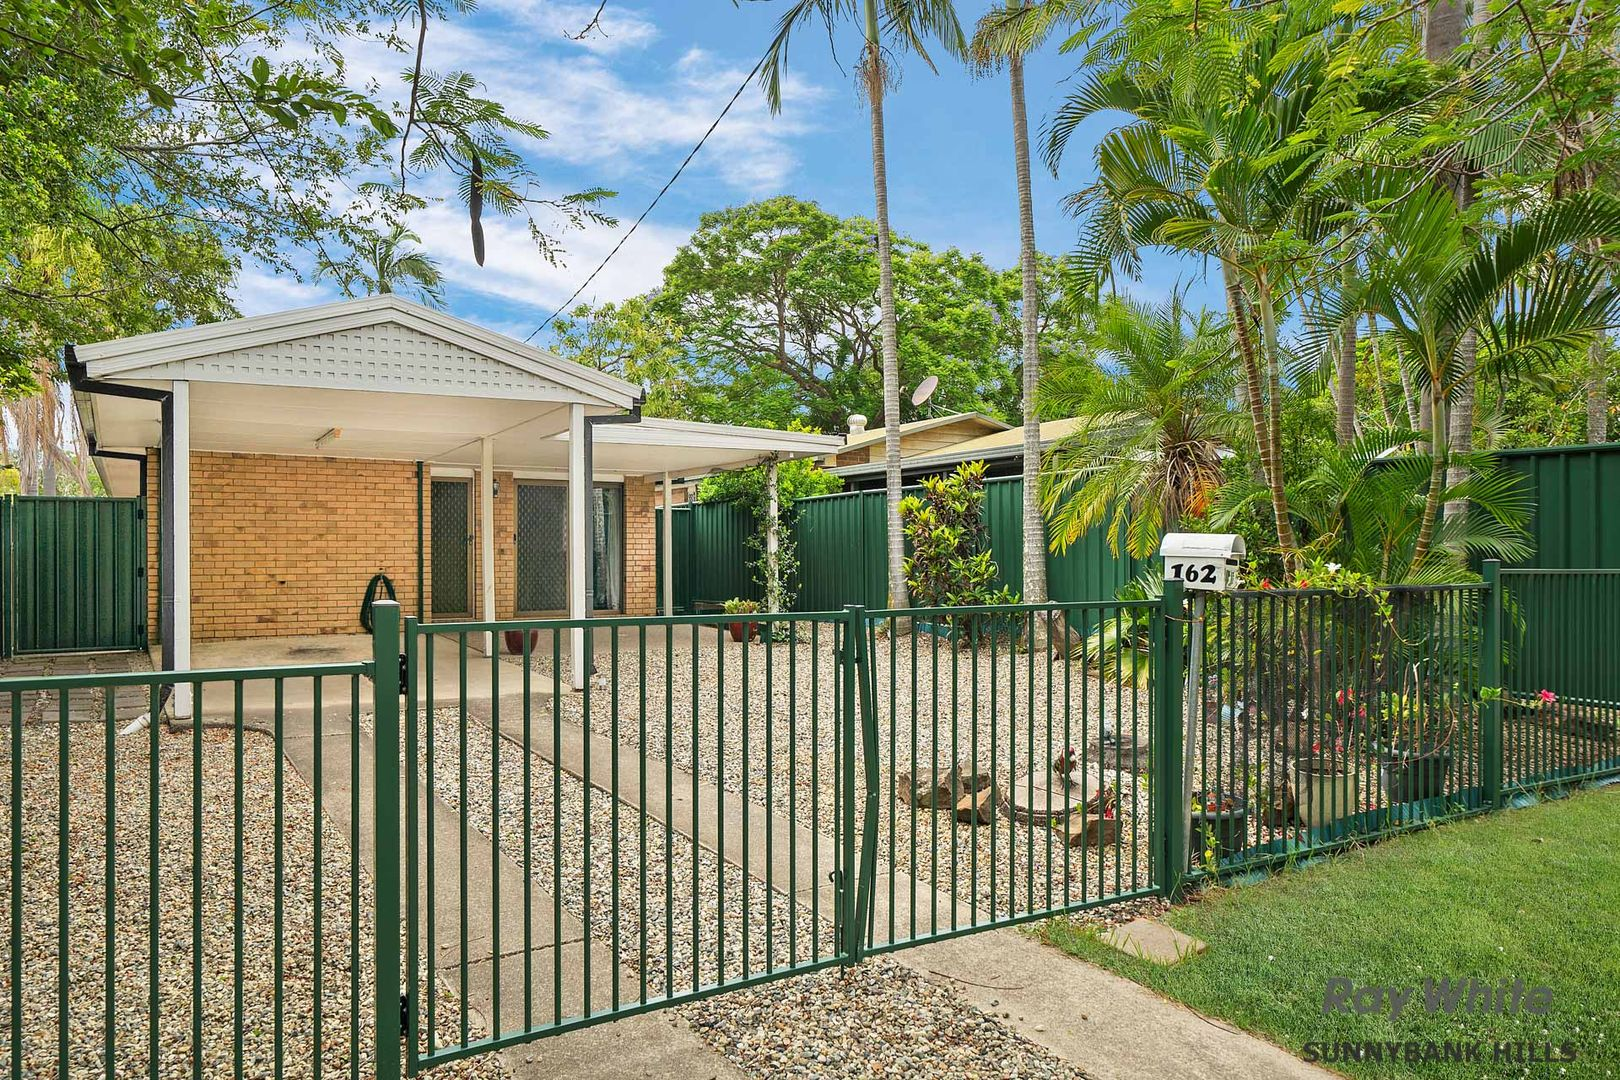 162 Morden Road, Sunnybank Hills QLD 4109, Image 0